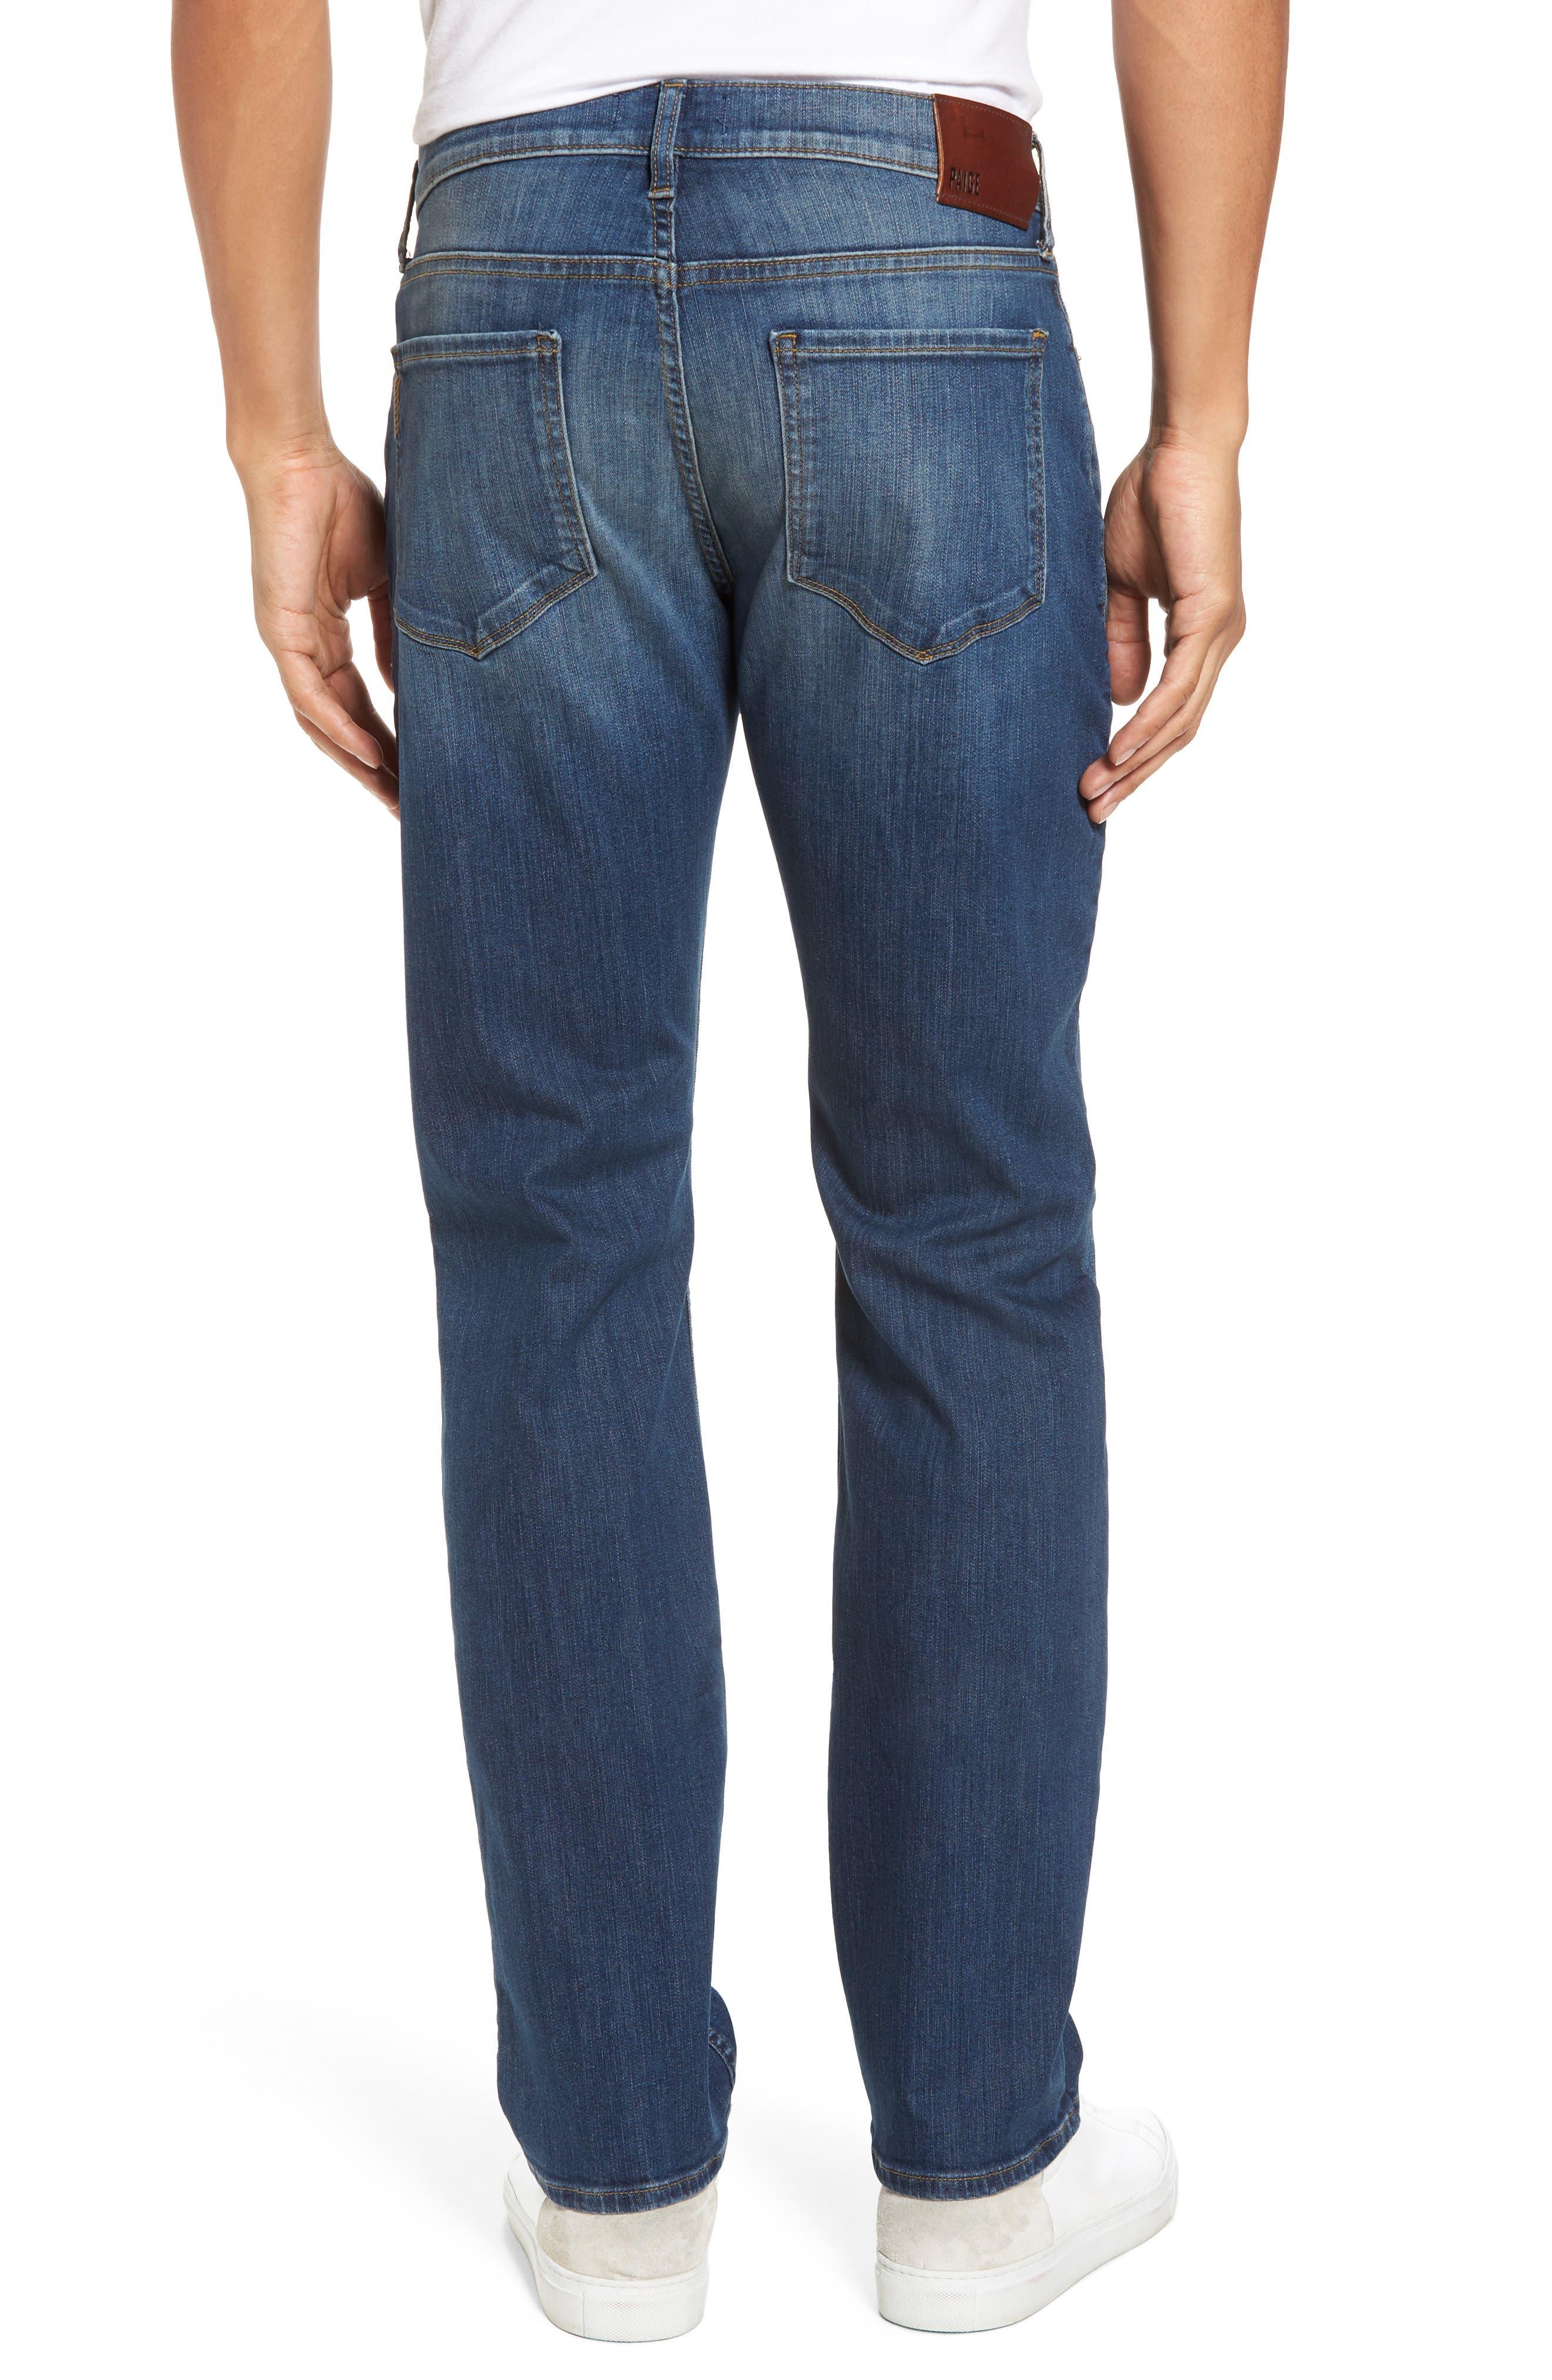 Legacy - Normandie Straight Leg Jeans,                             Alternate thumbnail 2, color,                             Harlan